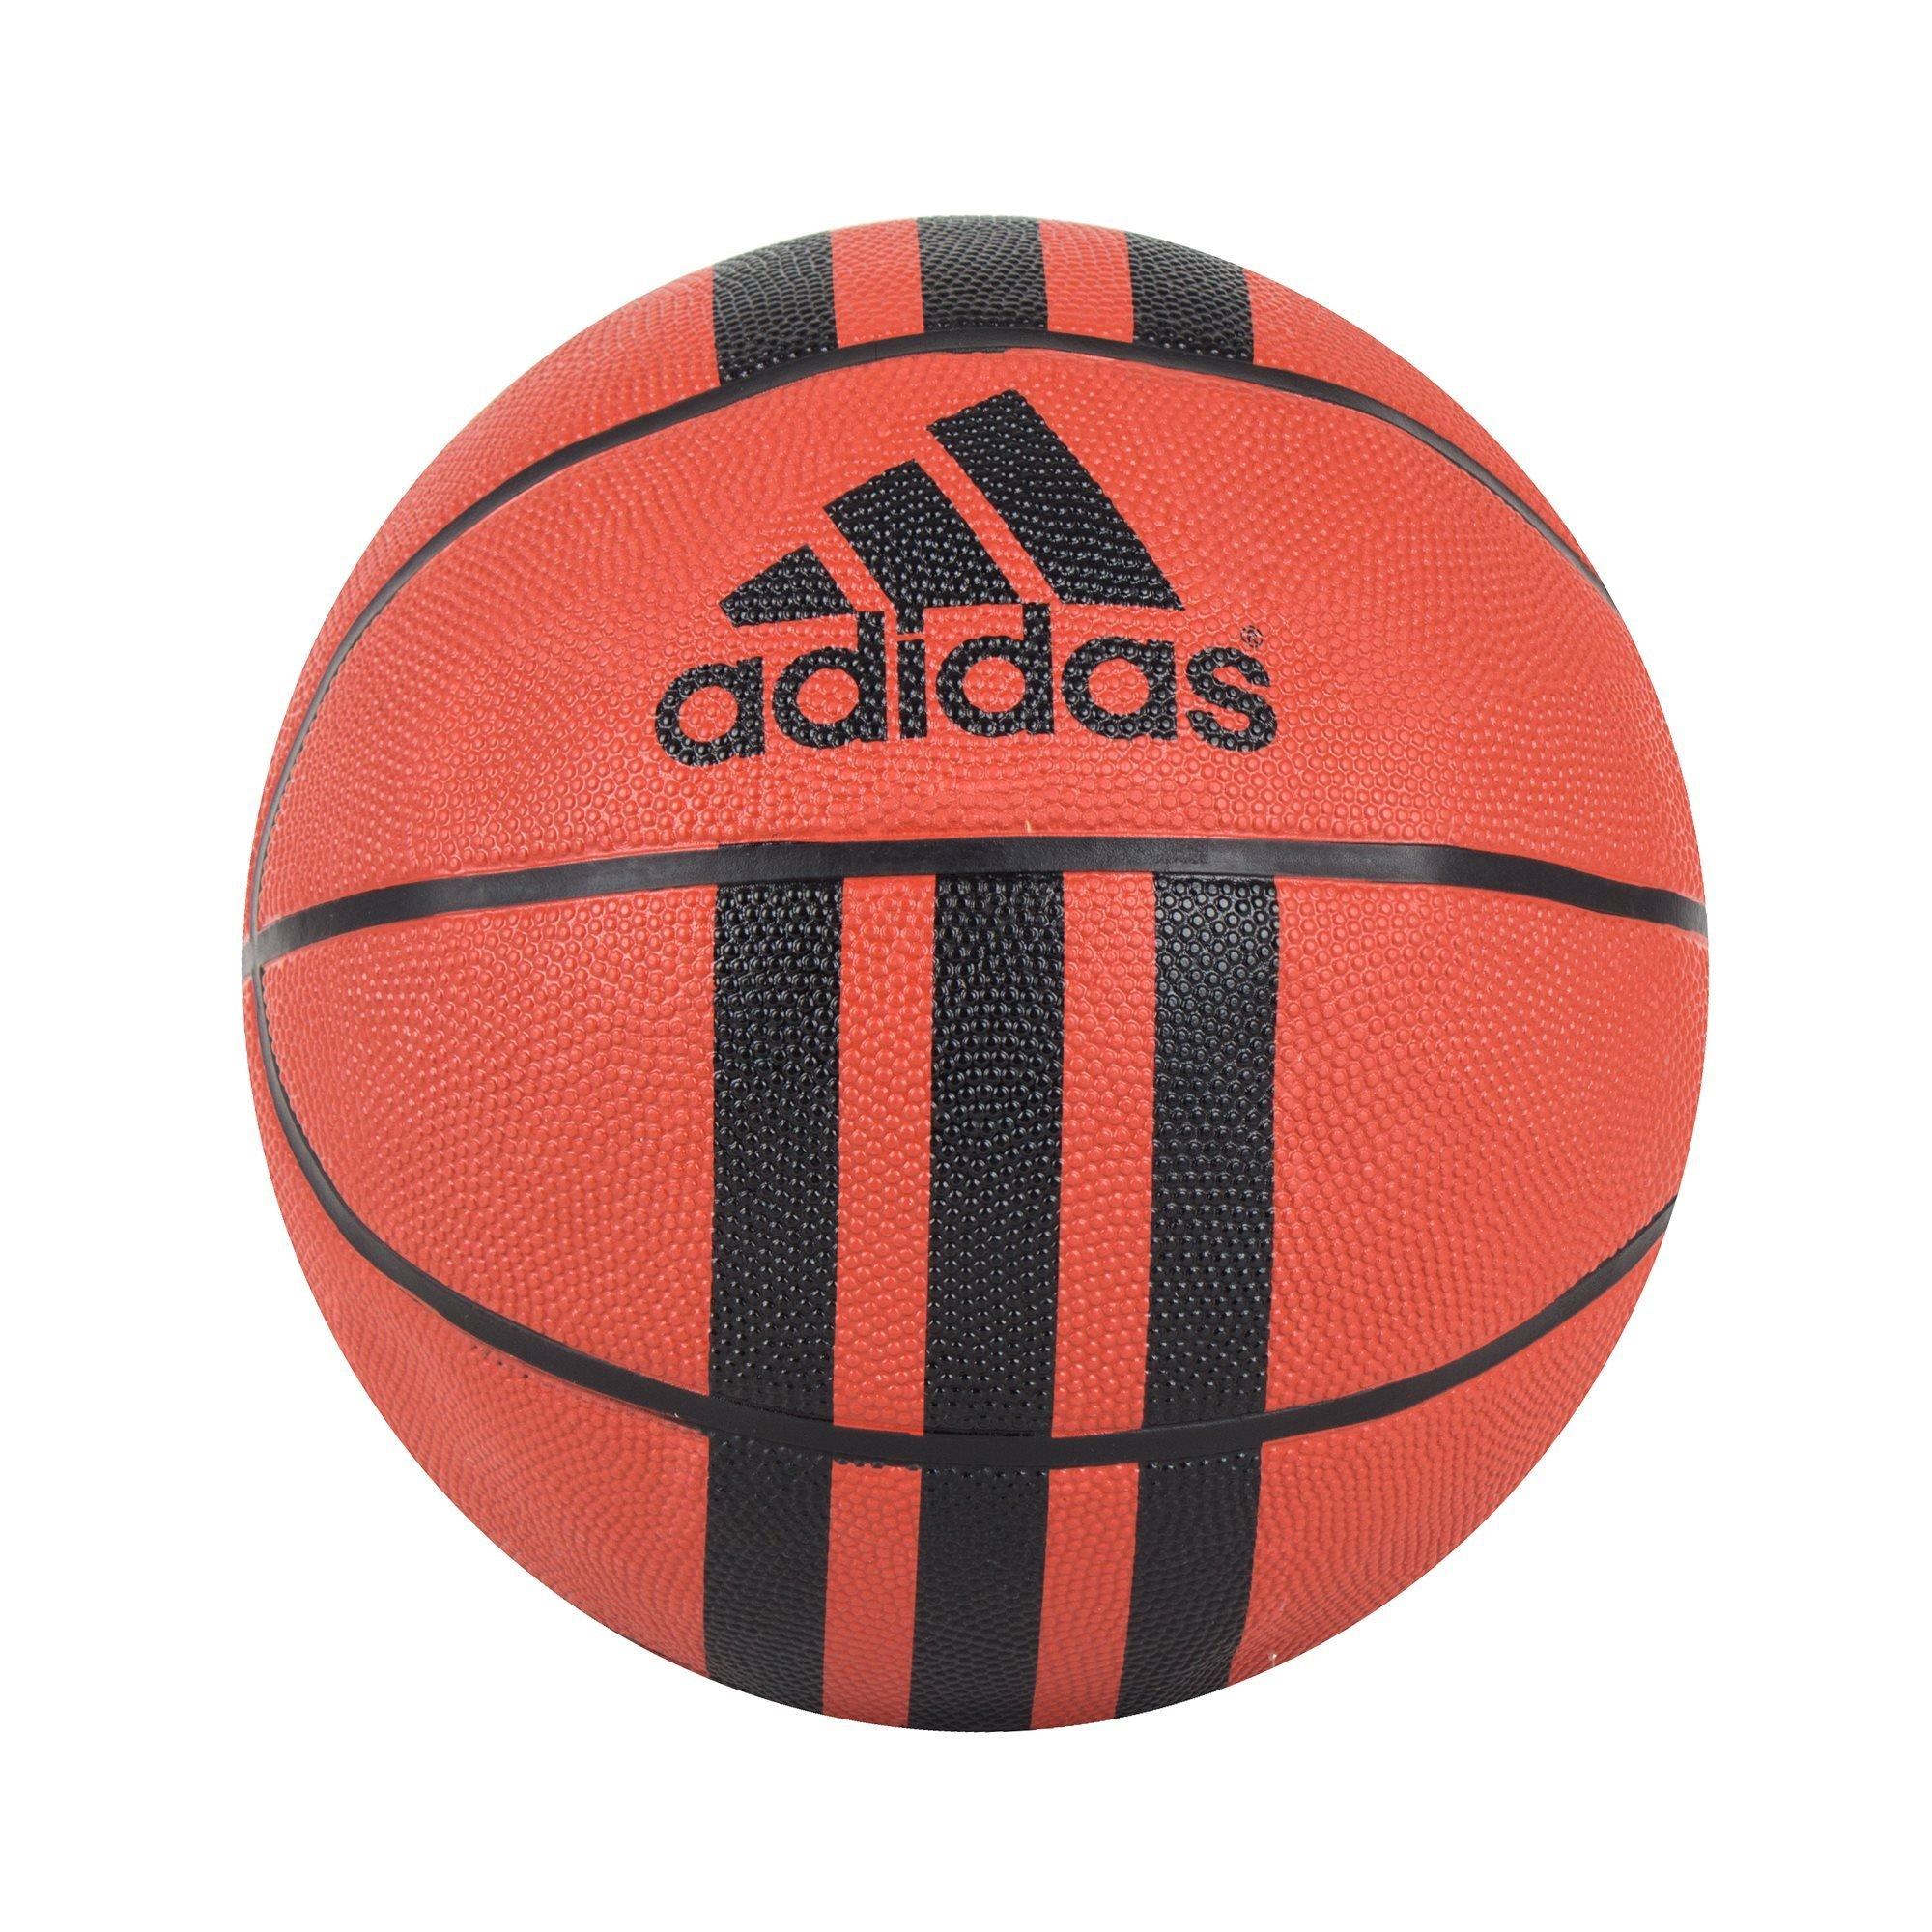 adidas Performance - Basket Ball 3 Stripes Size 7